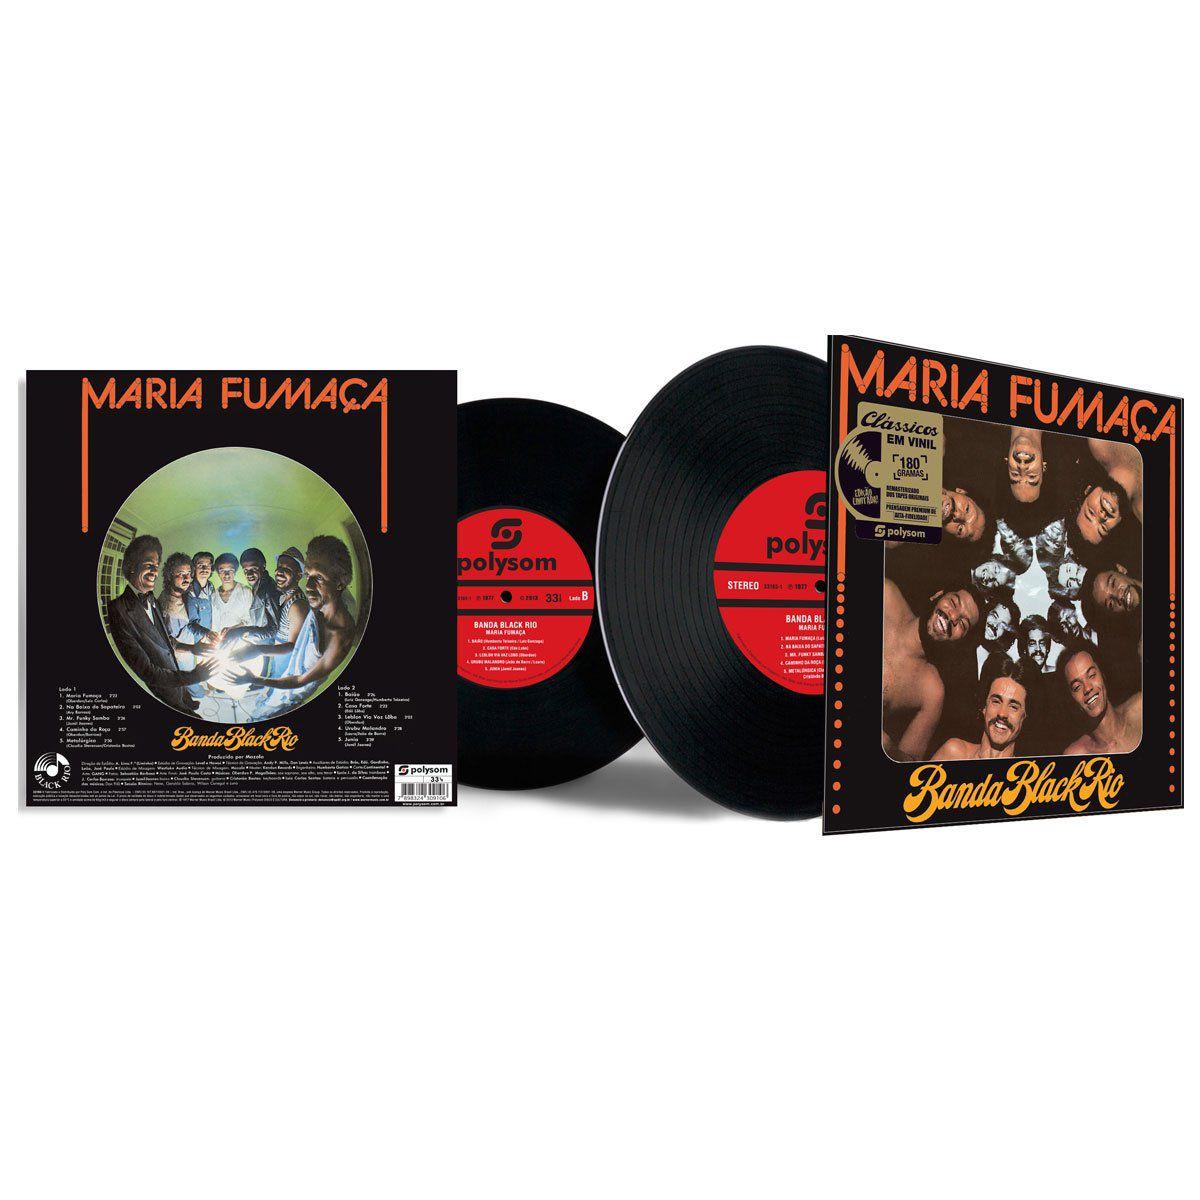 LP Banda Black Rio Maria Fumaça  - bandUP Store Marketplace